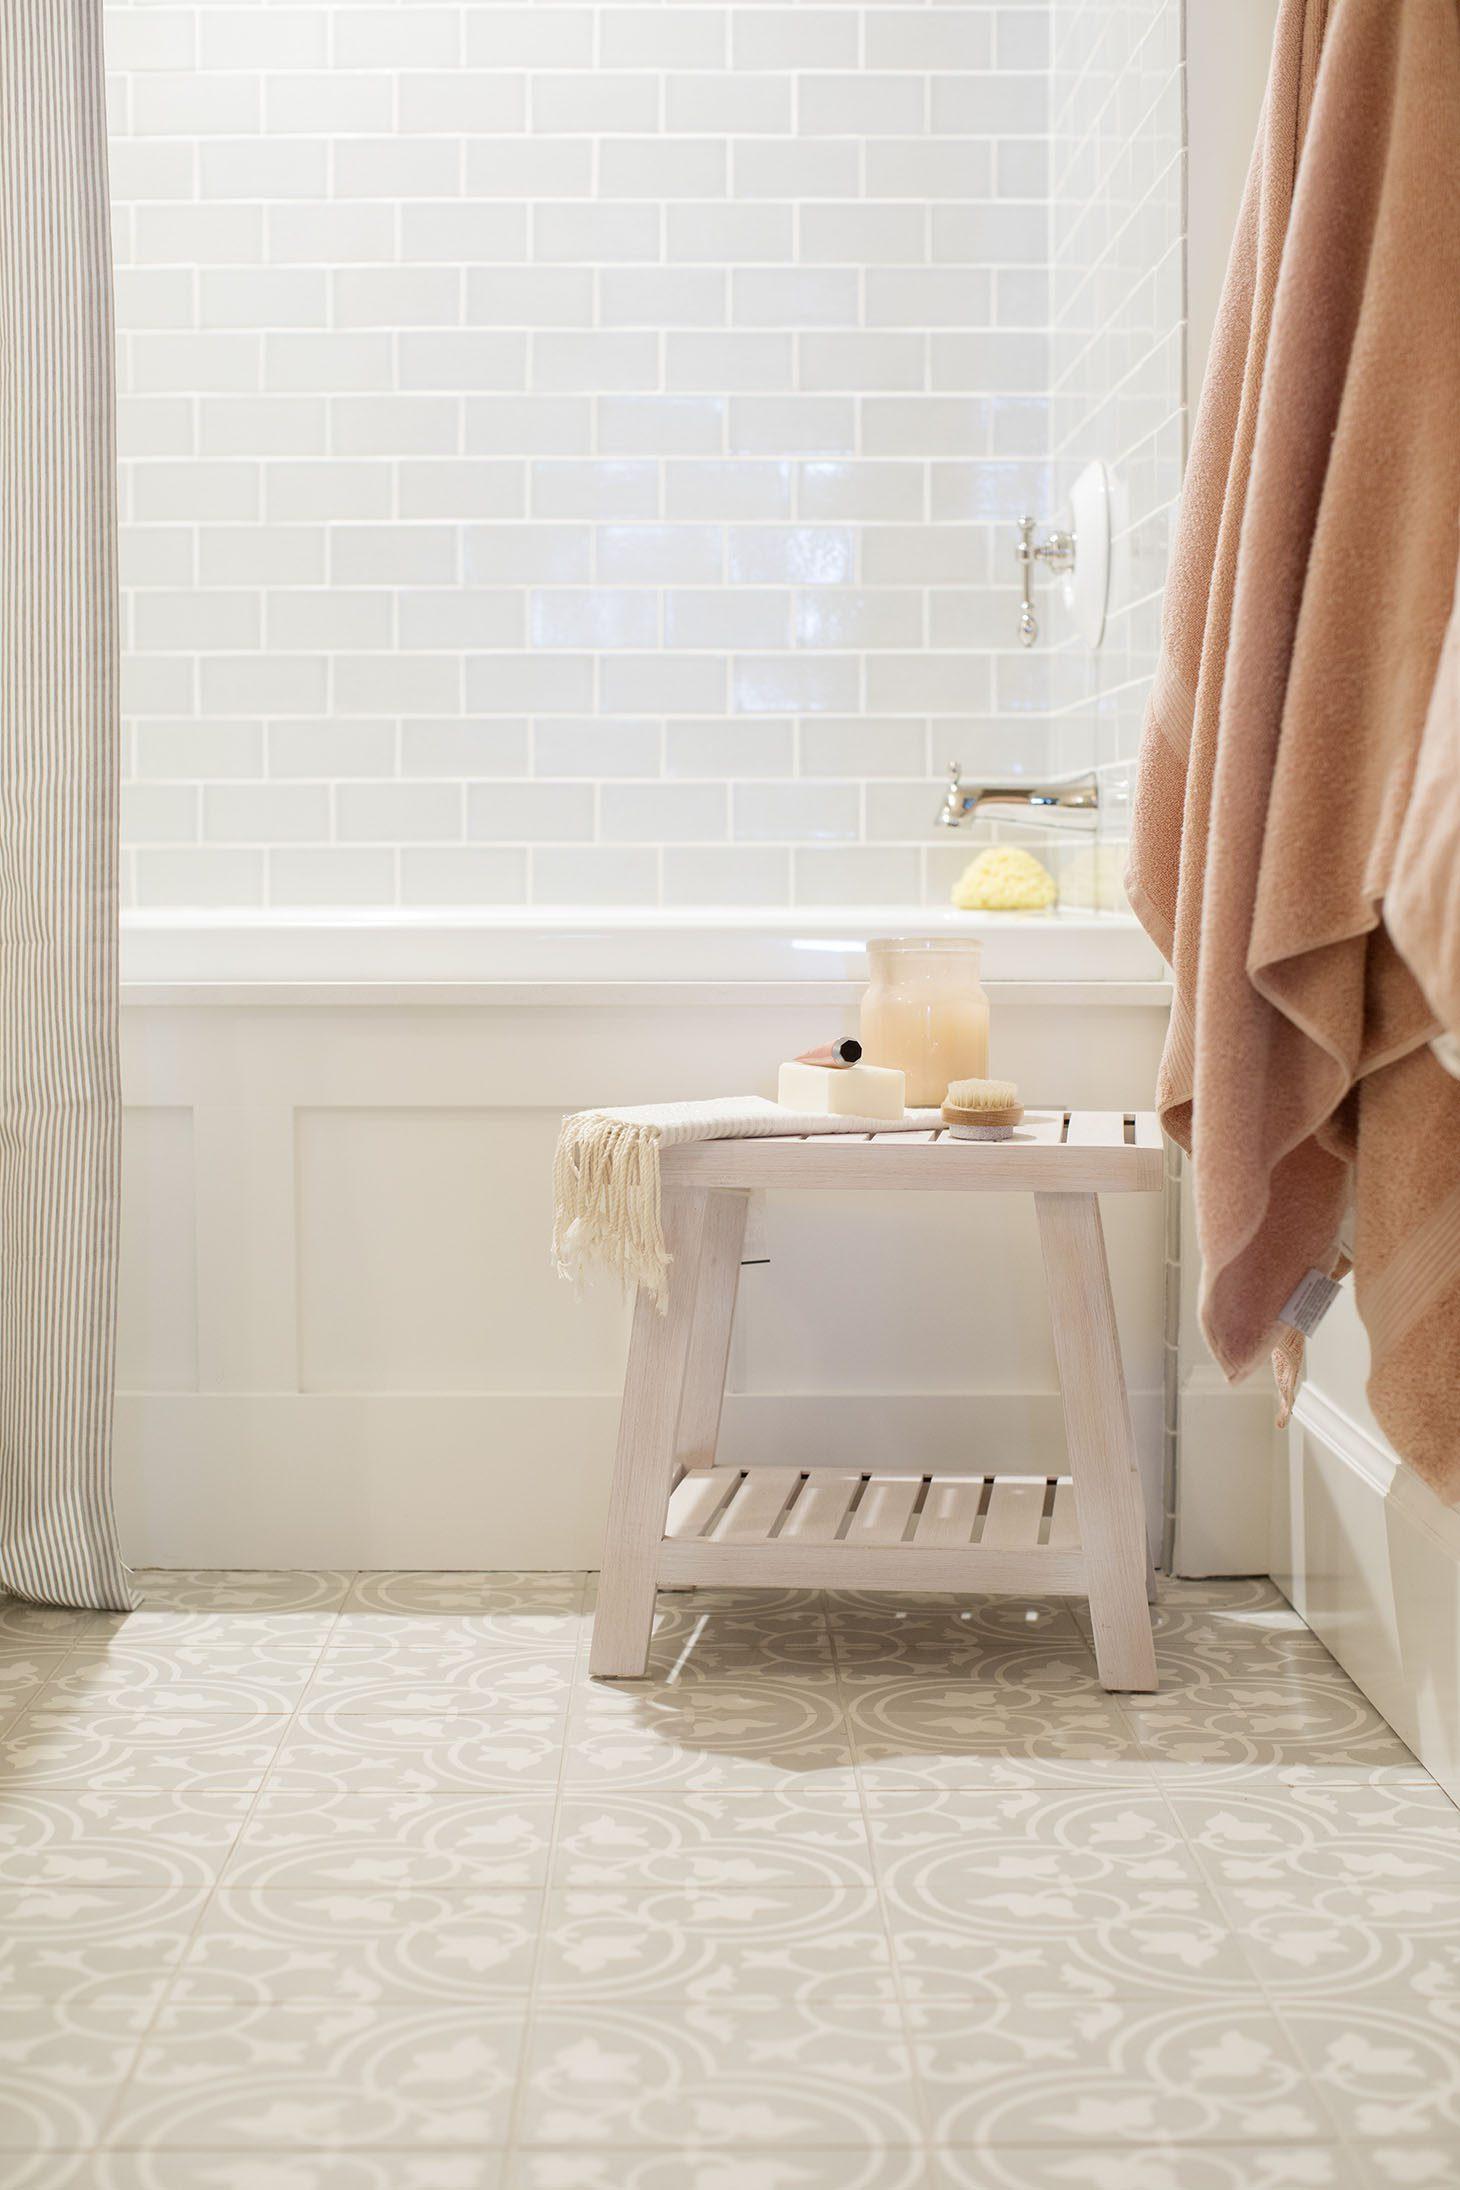 Jillian Harris Home Tour Series Spare Bedroom and Bathroom